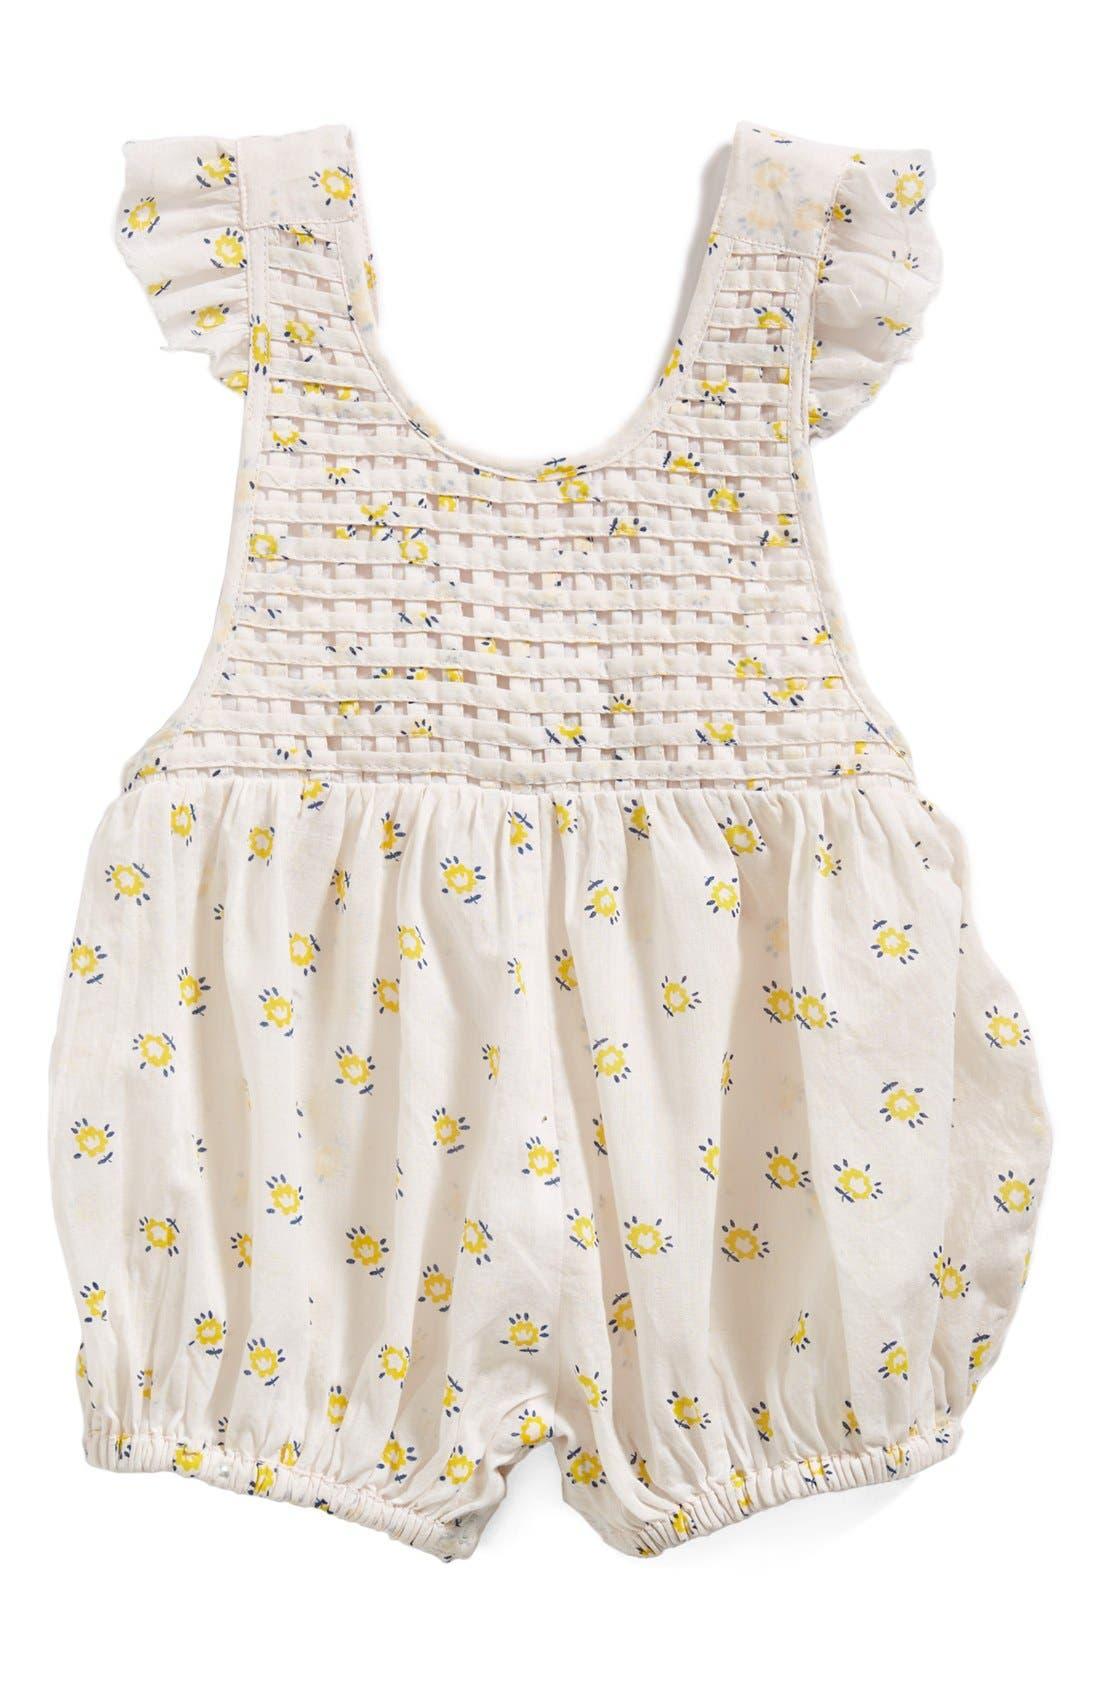 Alternate Image 1 Selected - Stella McCartney Kids Flower Print Romper (Baby Girls)